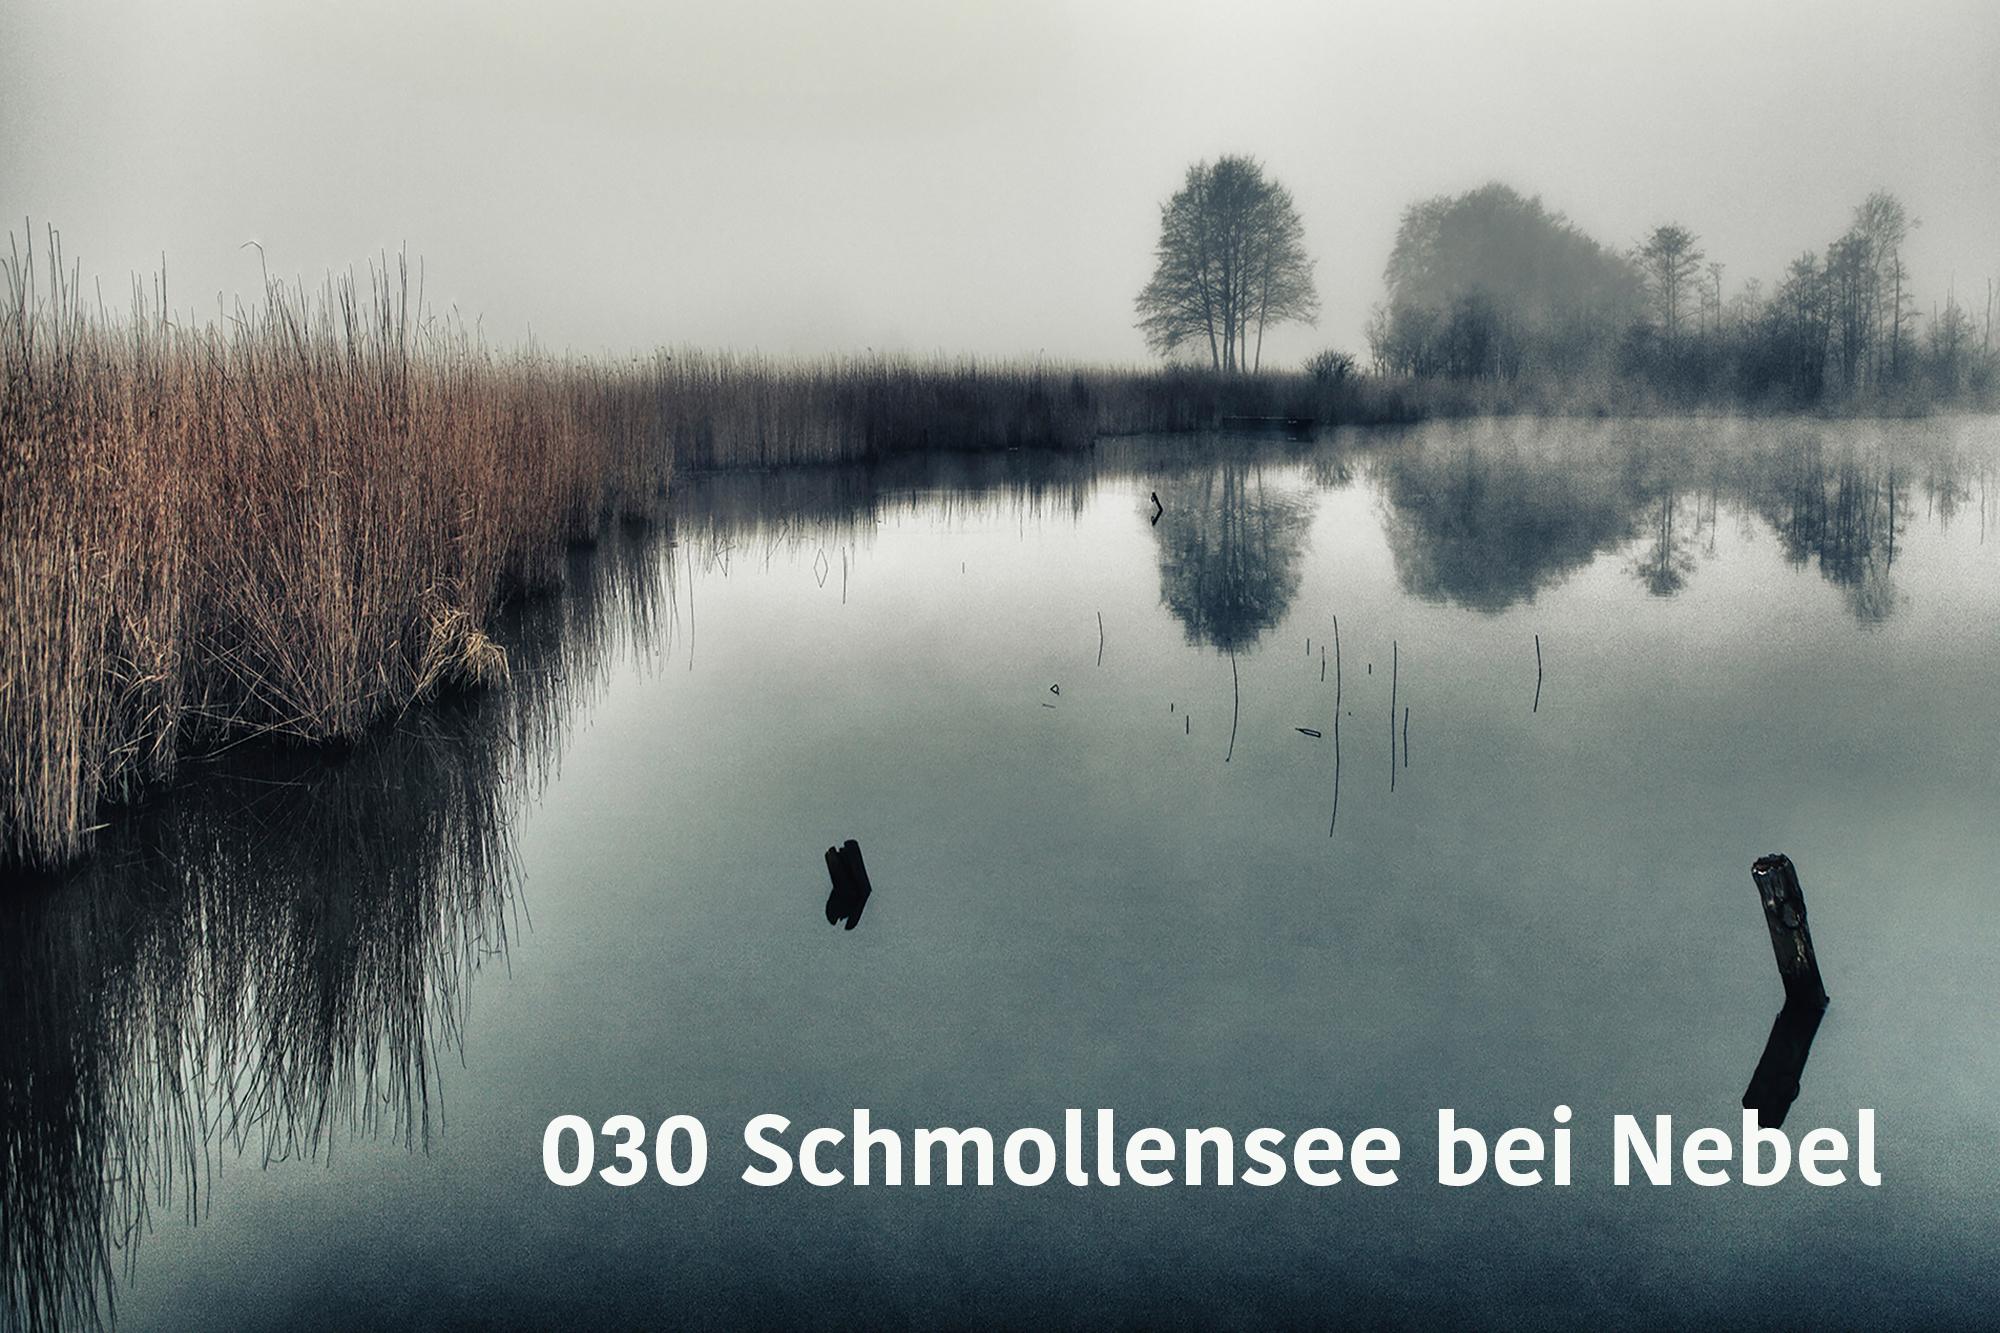 Usedom Motive (2) Canvasleinwanddruck auf Keilrahmen 60 x 80